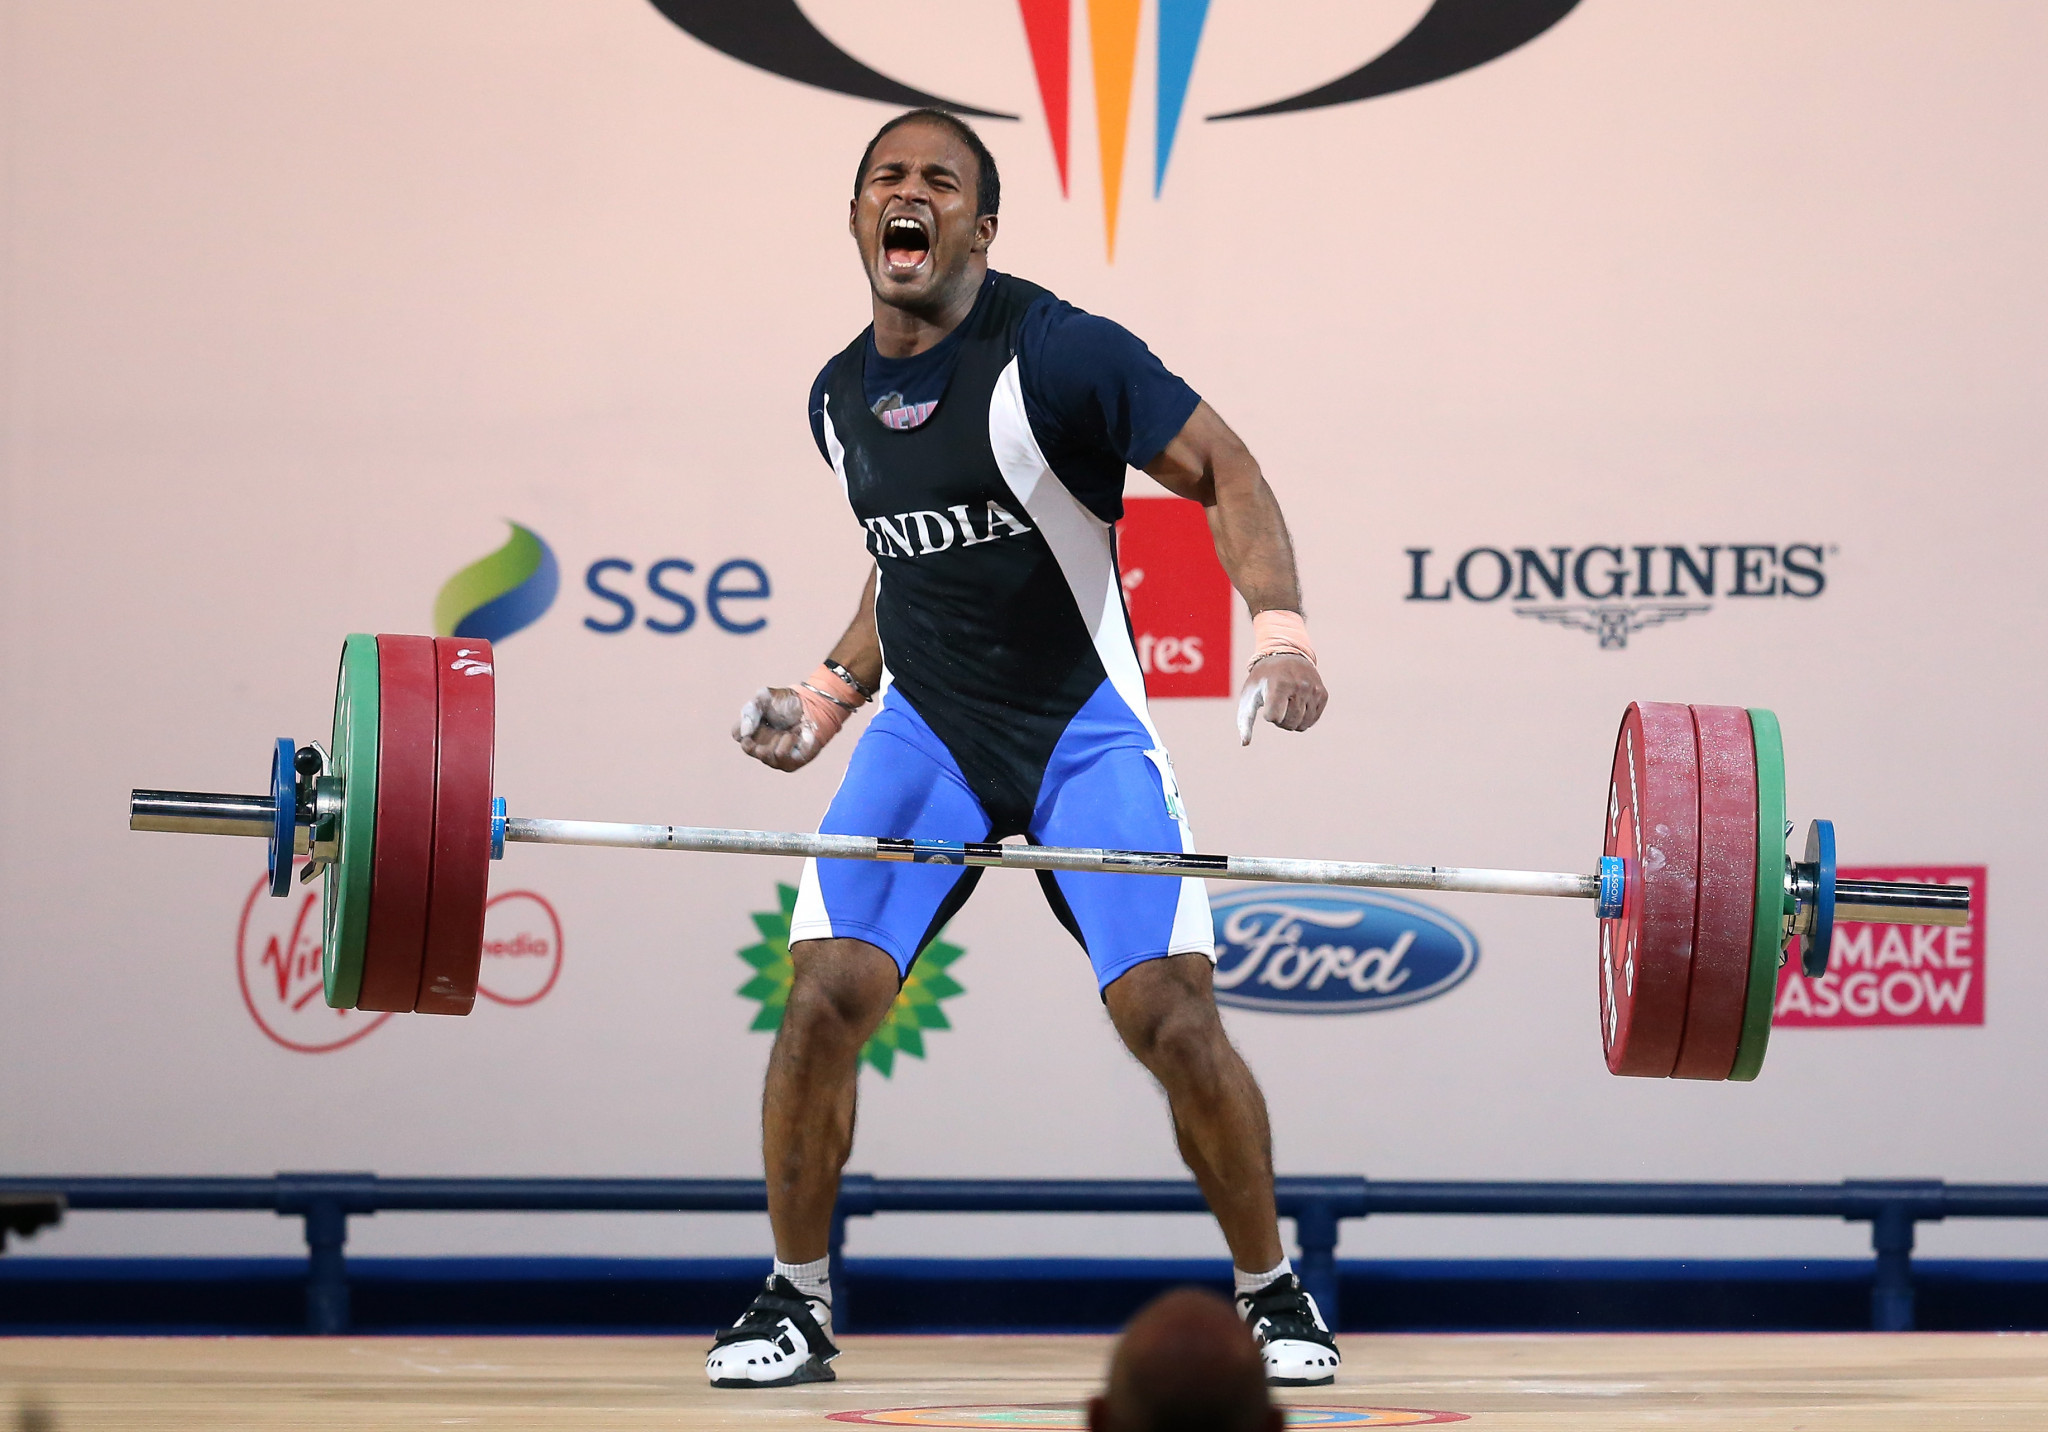 Sathish Sivalingam won gold at Glasgow 2014 ©Getty Images